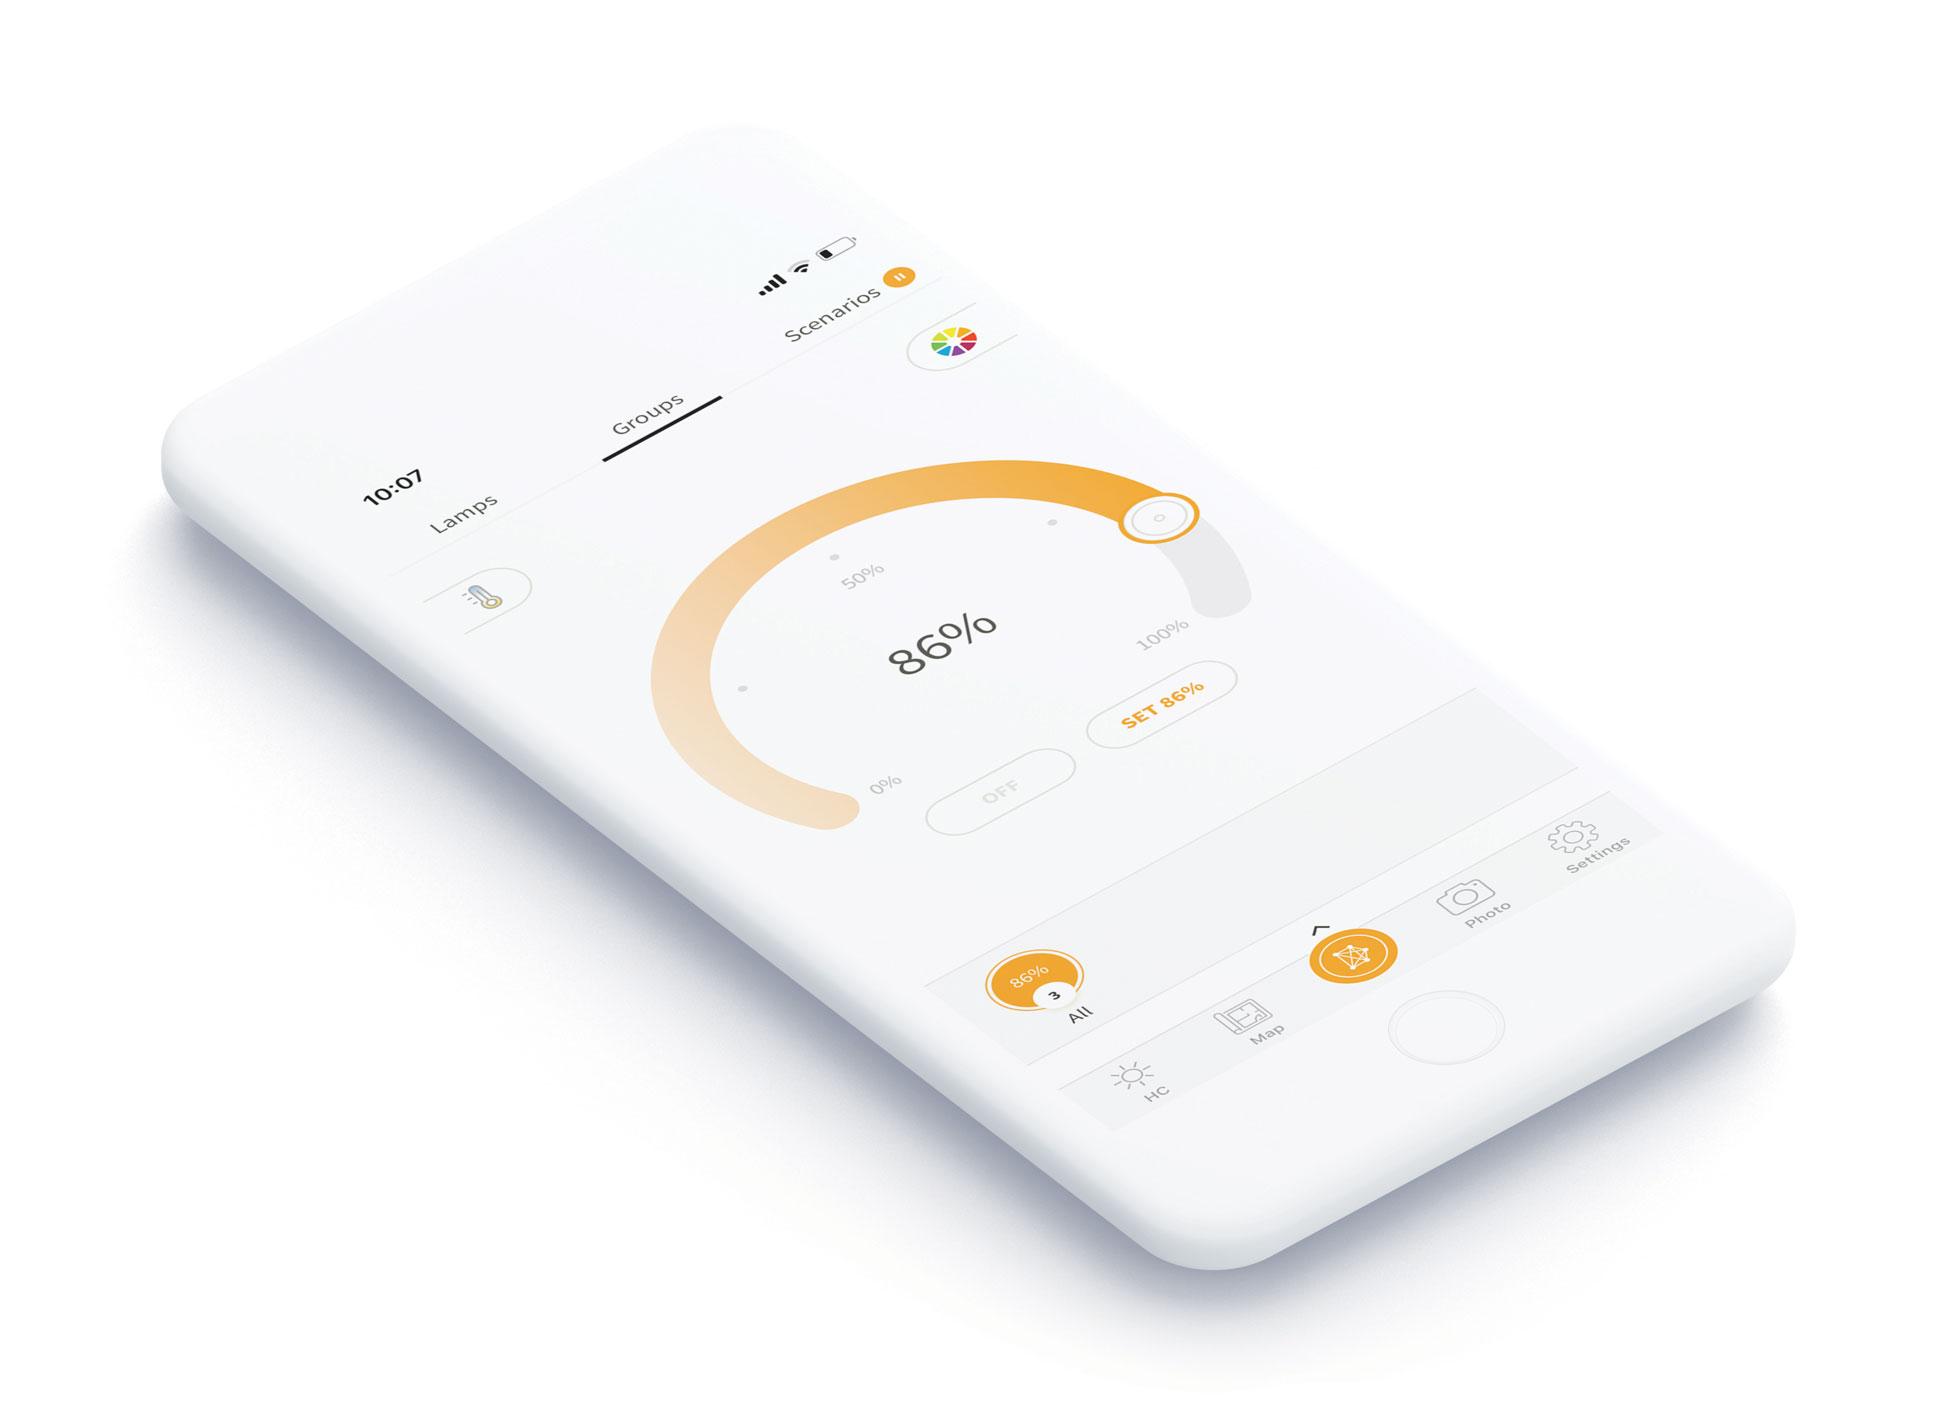 Produkt des Monats: DARA Smart Lighting System